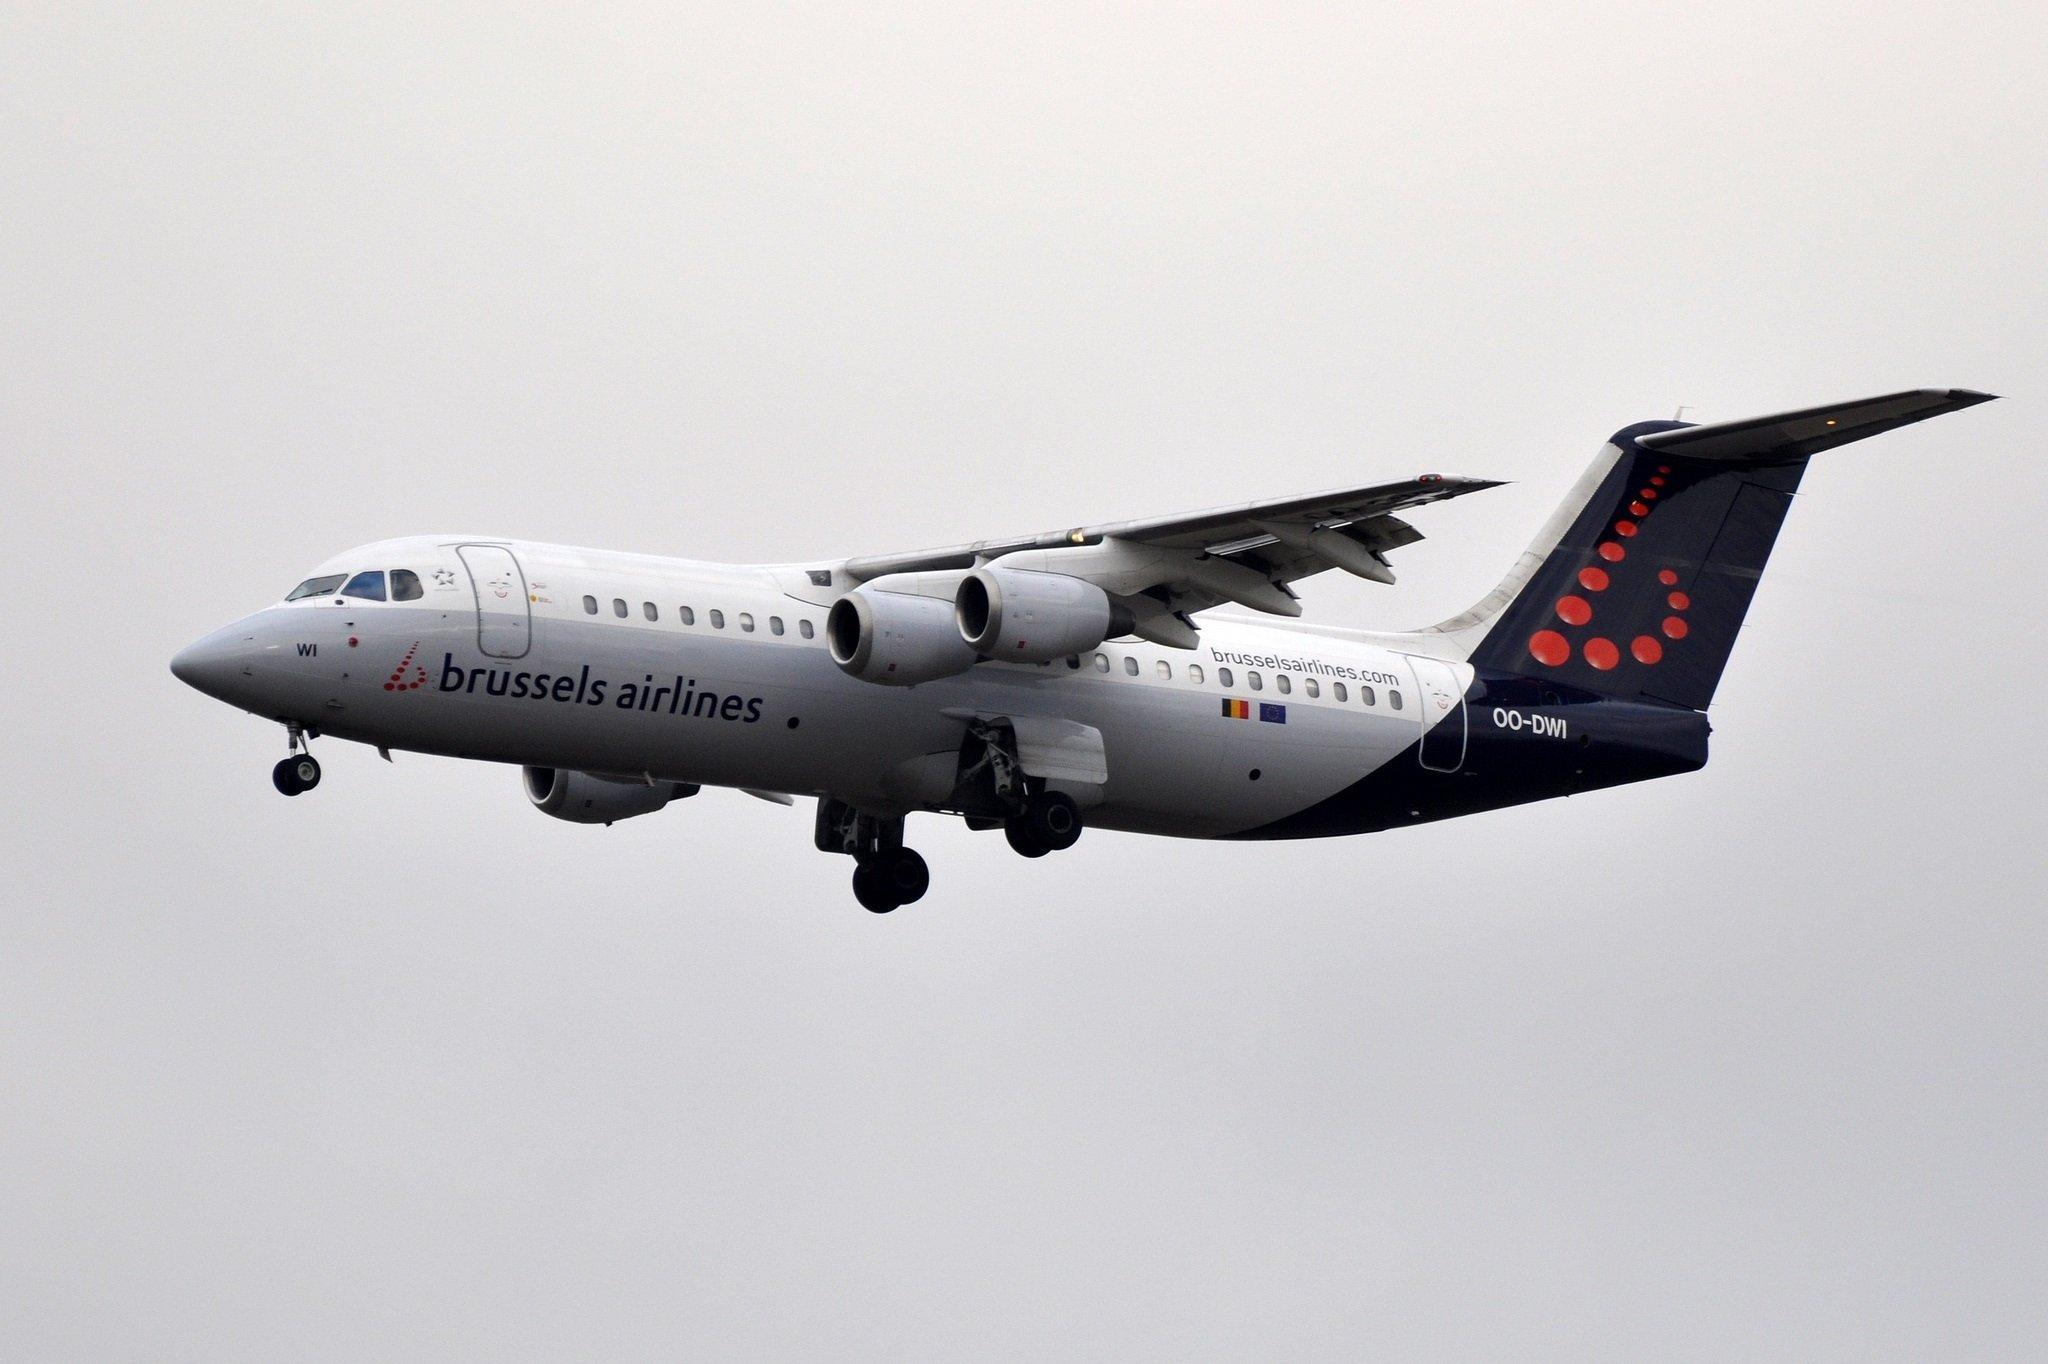 BAE 146 / AVRO RJ 100